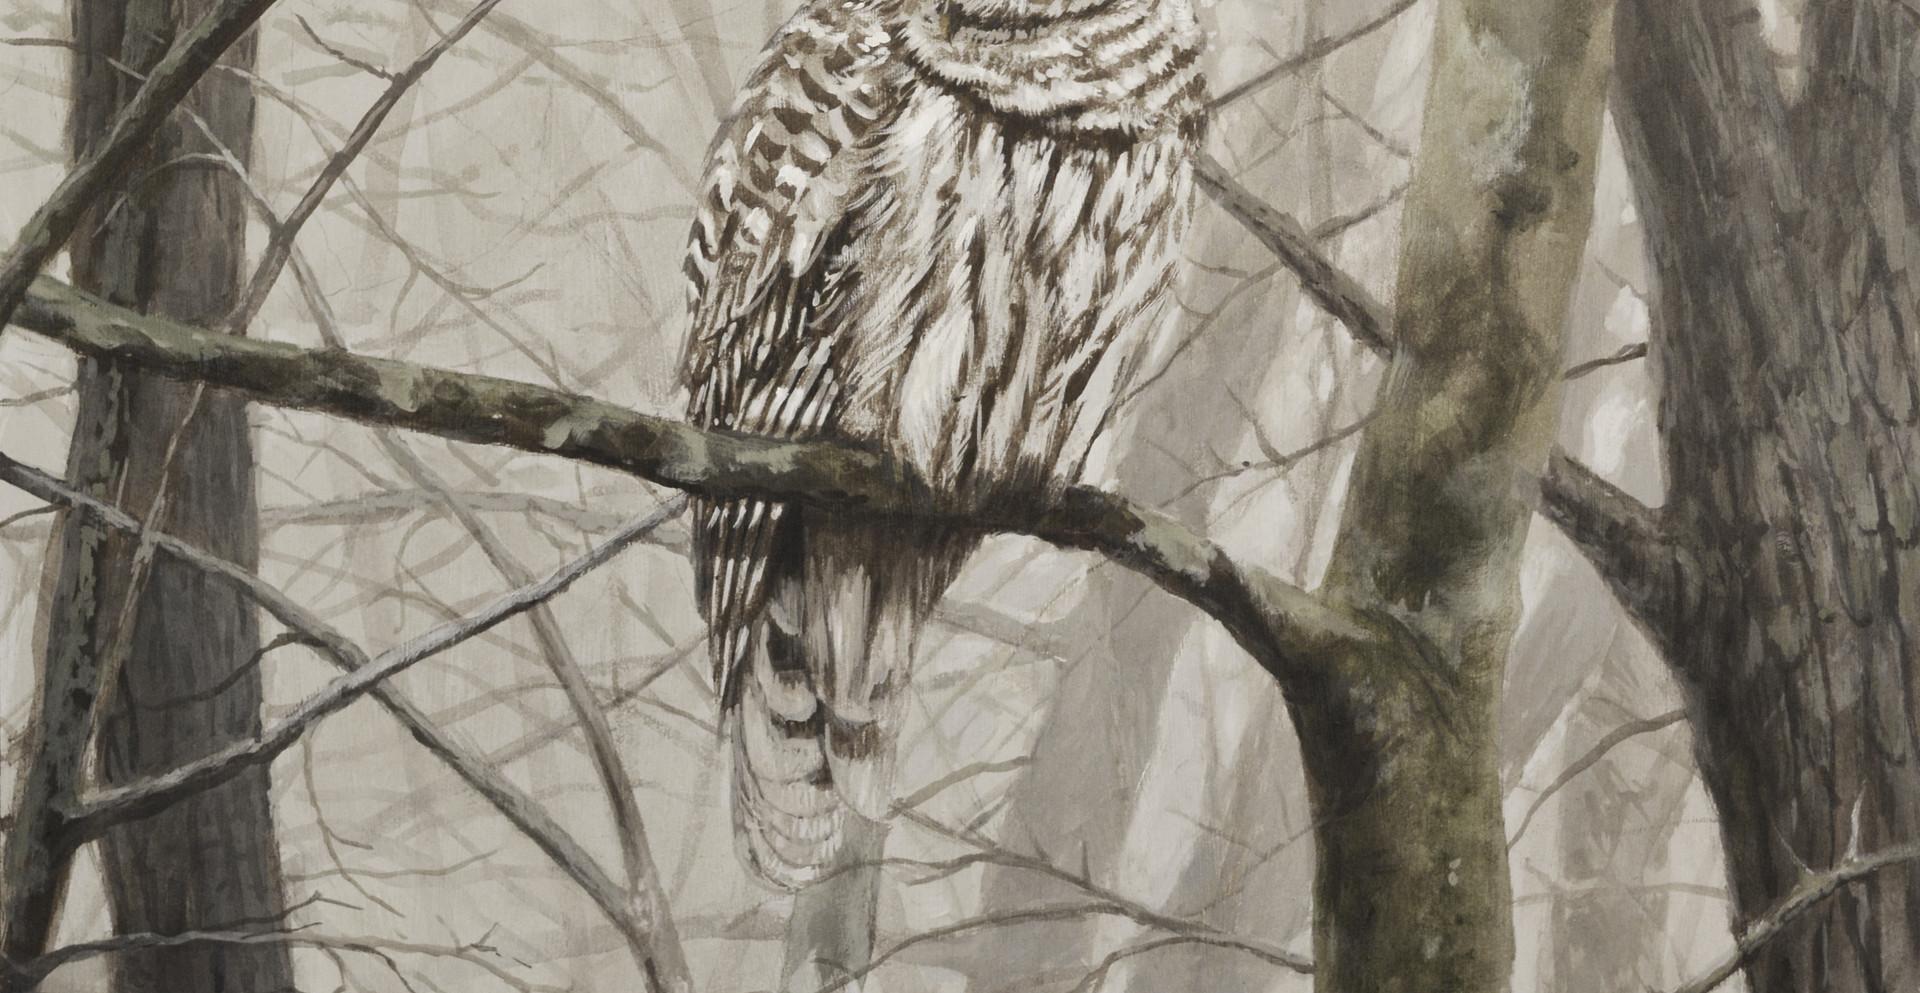 Barred Owl Final